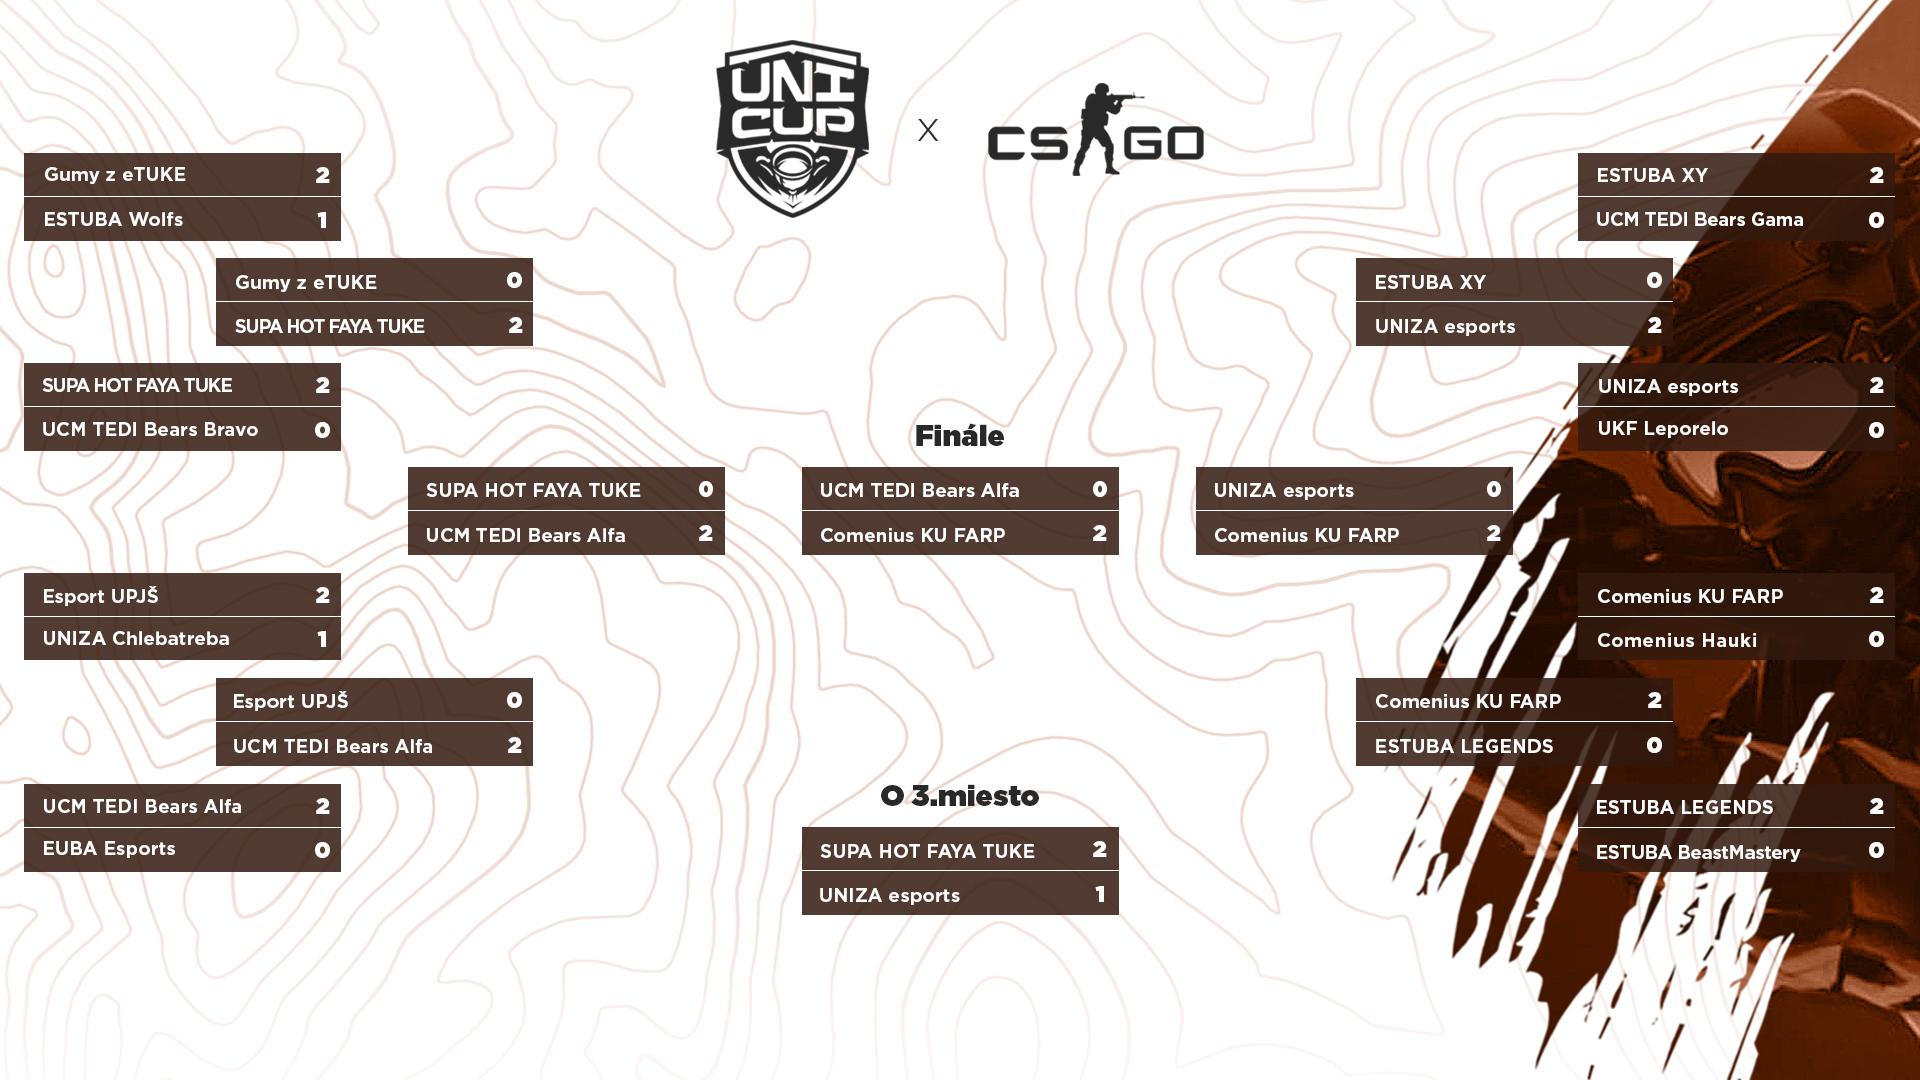 Takto prebiehalo play-off CS:GO turnaja.